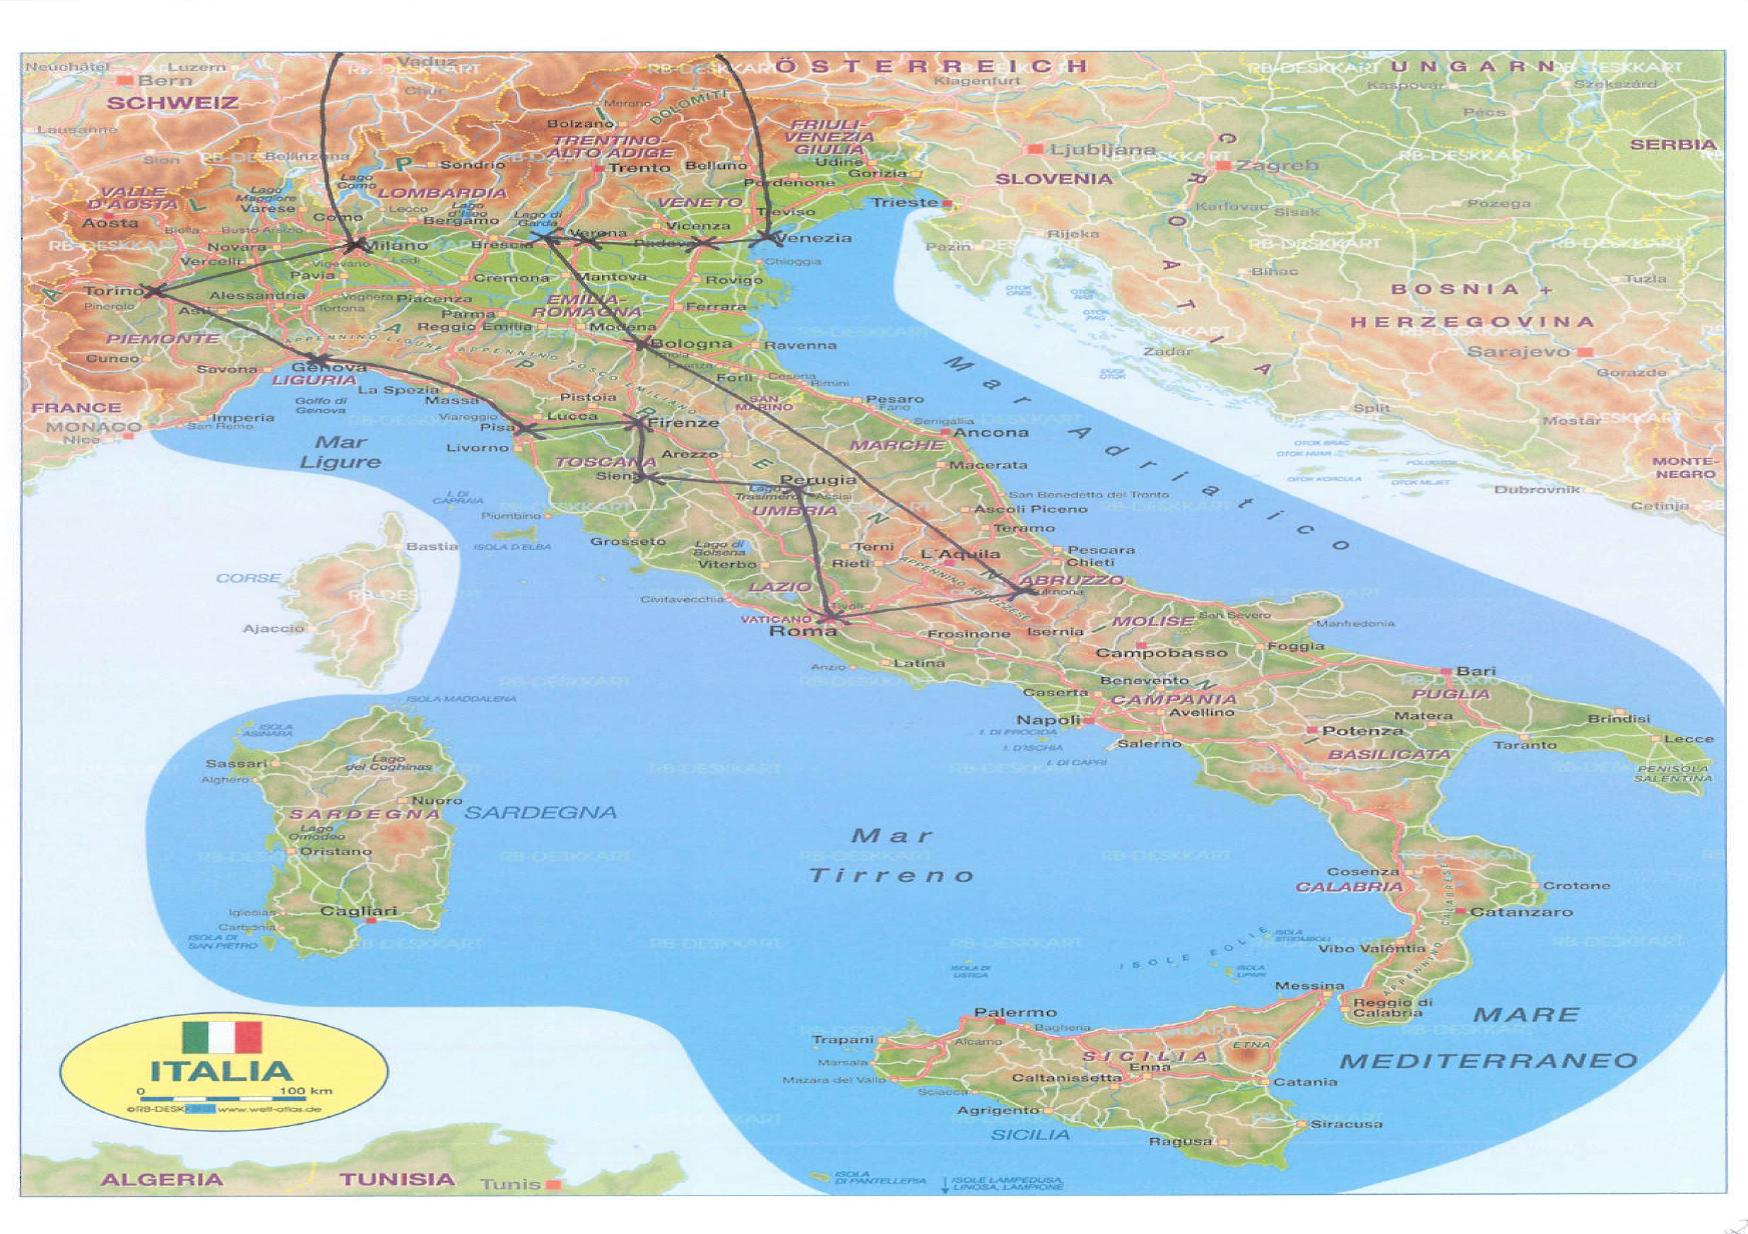 tour durch italien